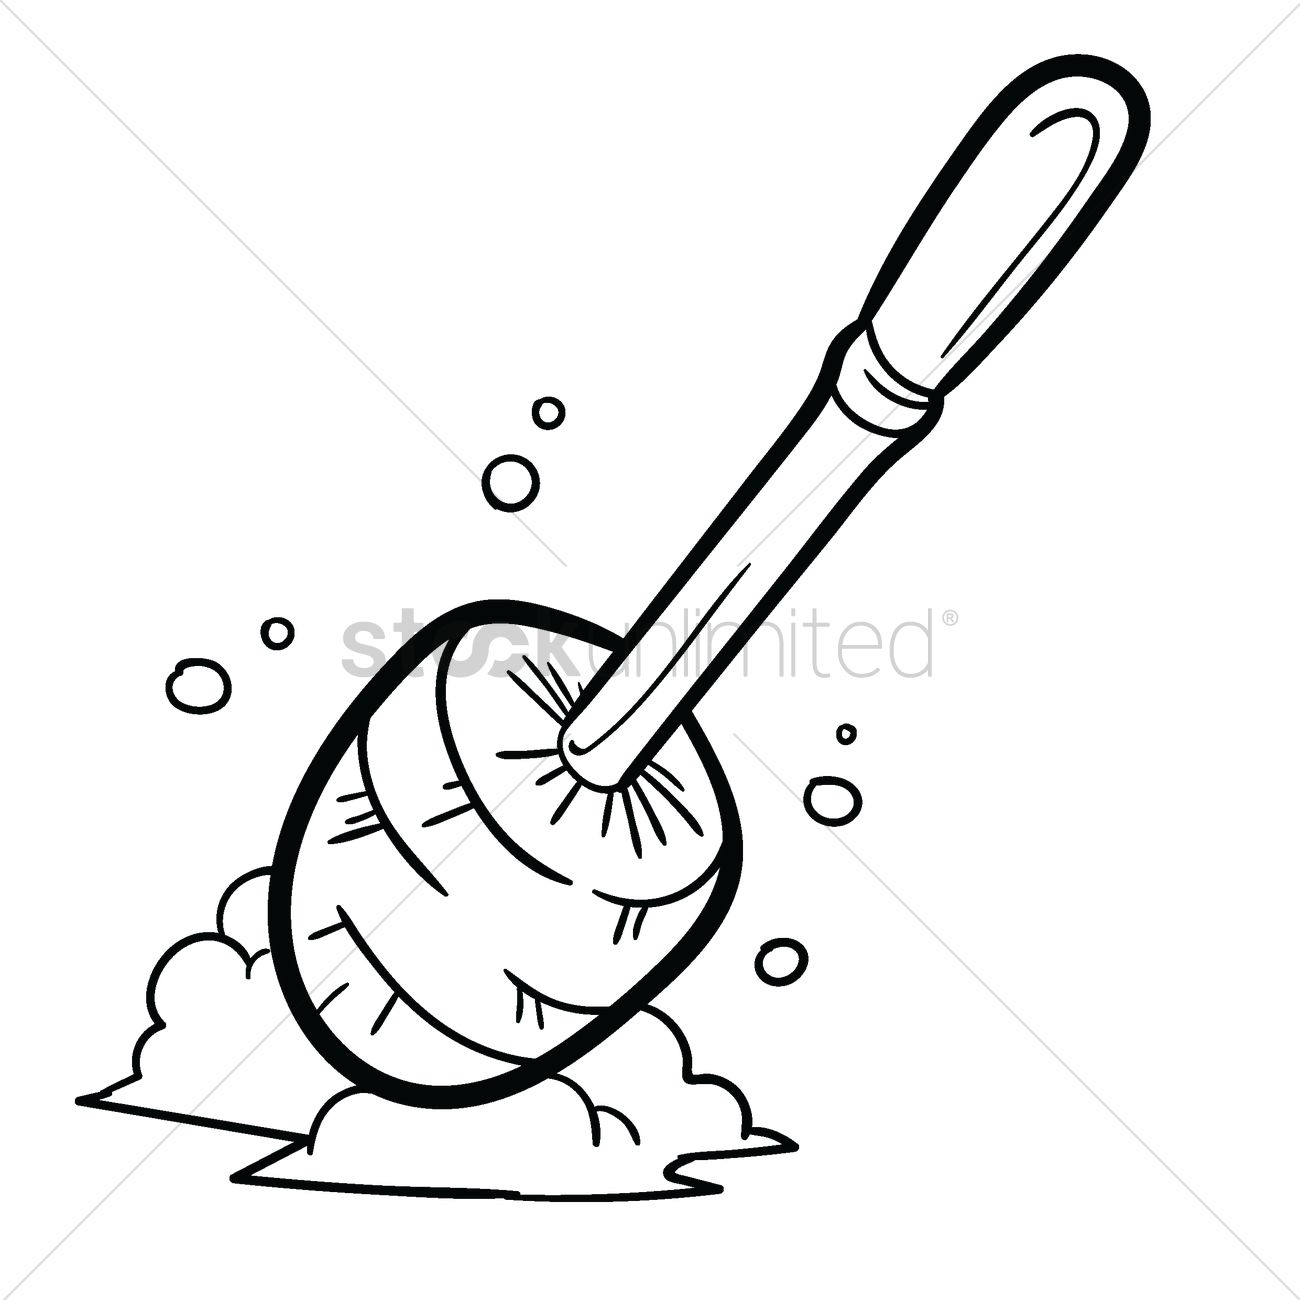 Toilet Brush Vector Image